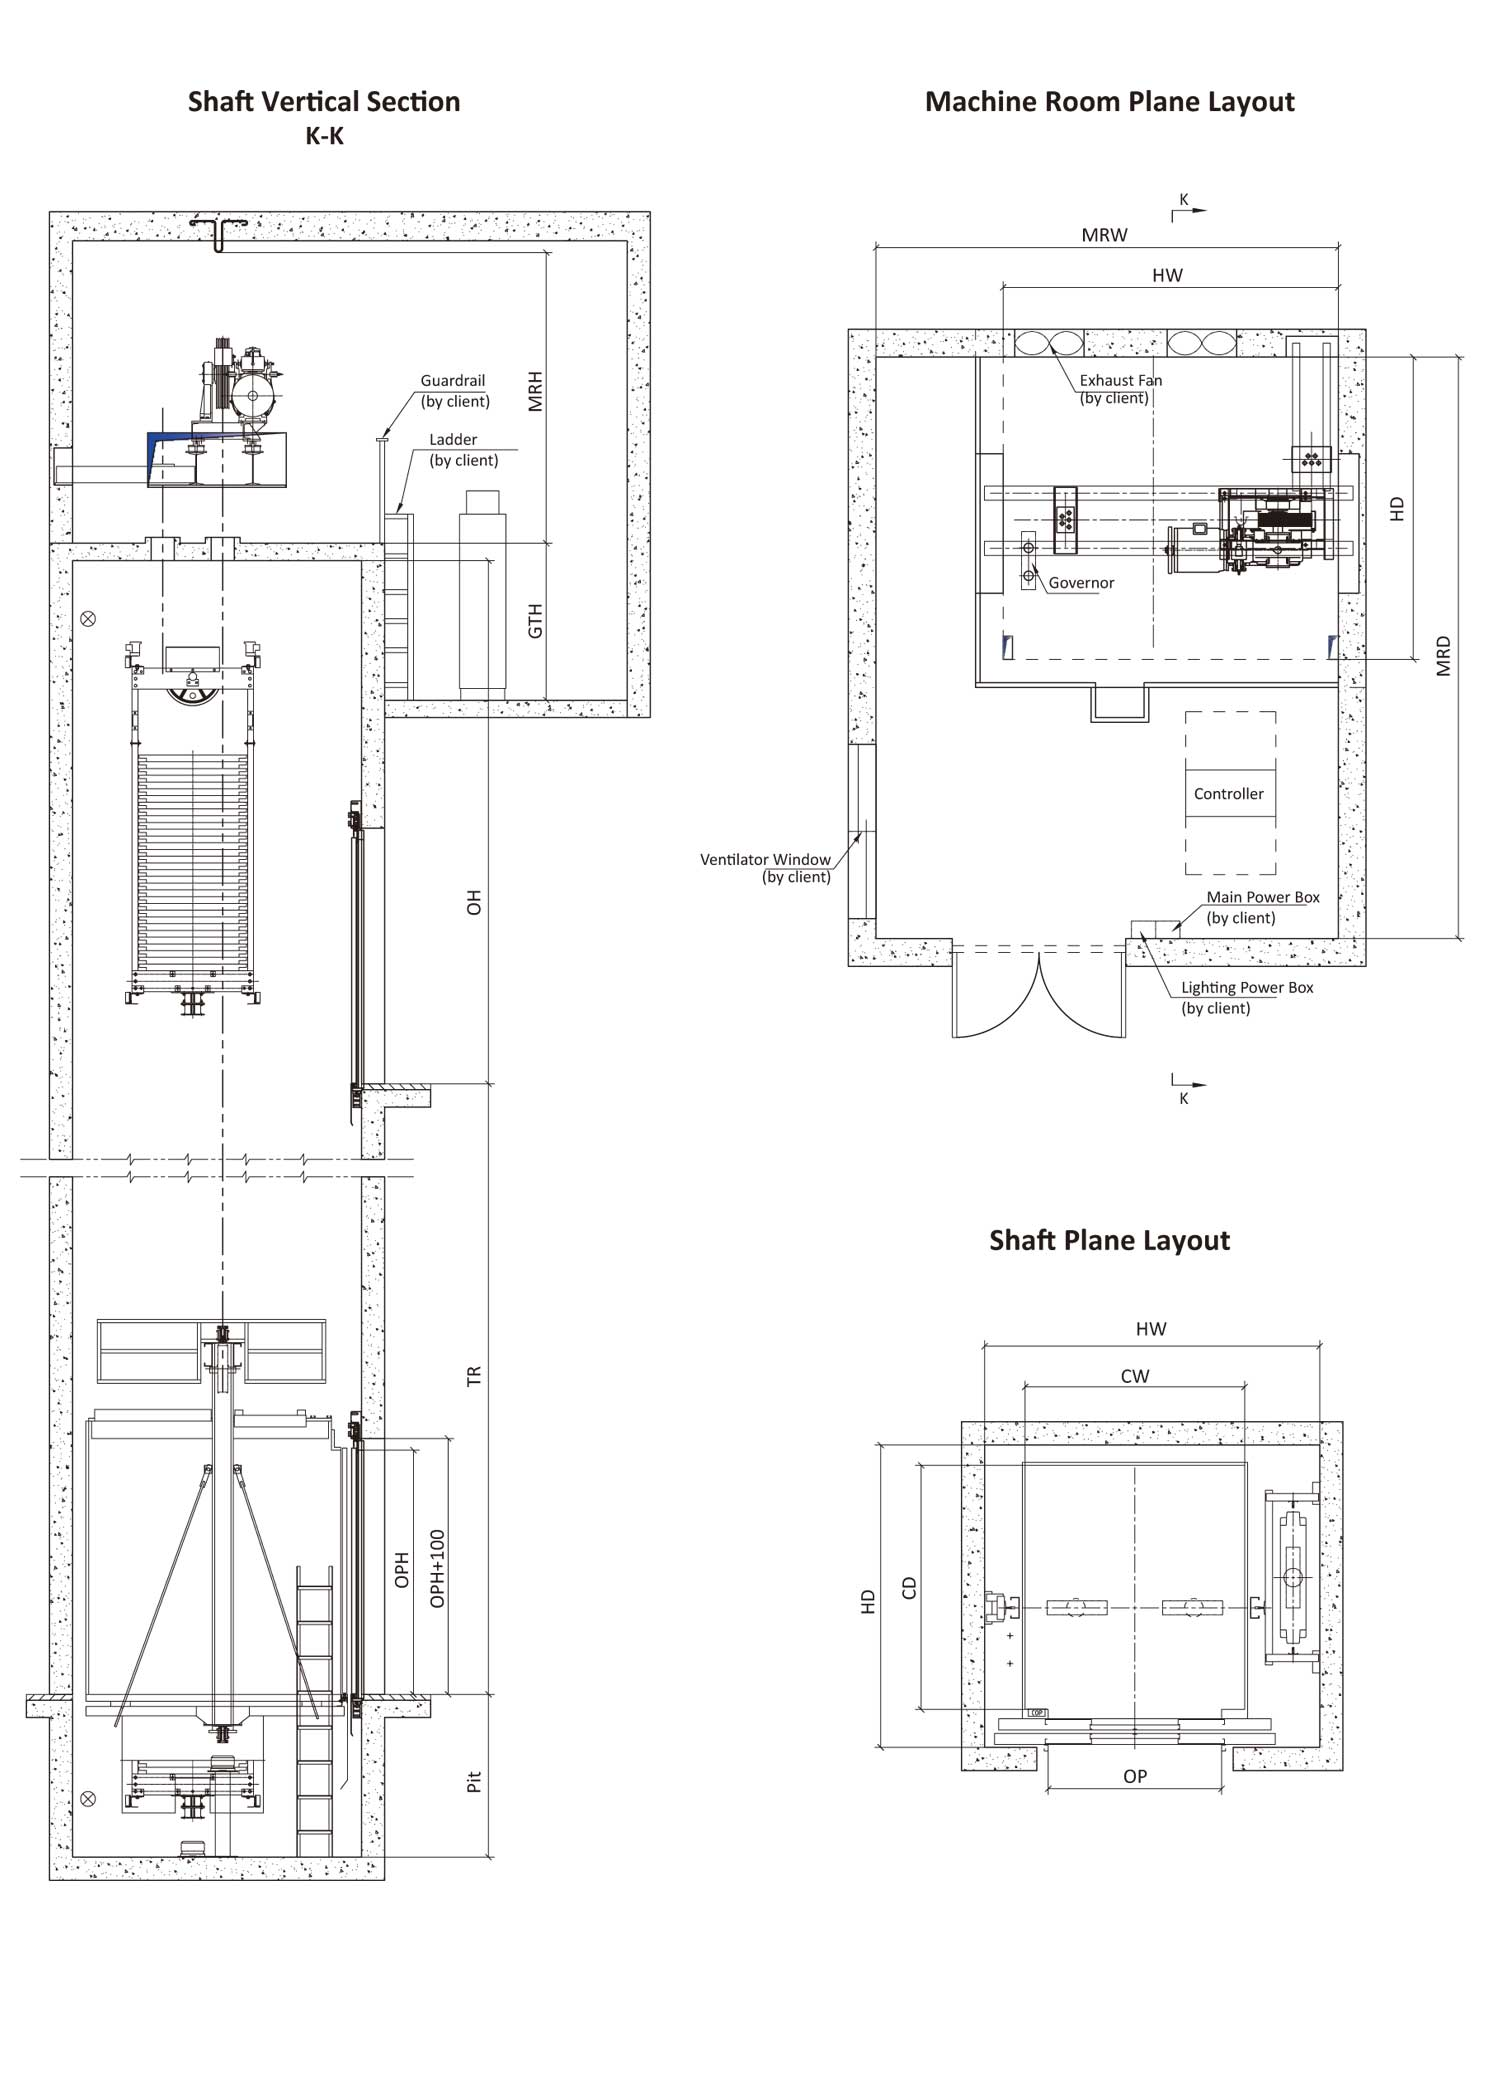 Freight Elevator Ele Tech Co Ltd Myanmar Escalator Schematic Machine Roomless